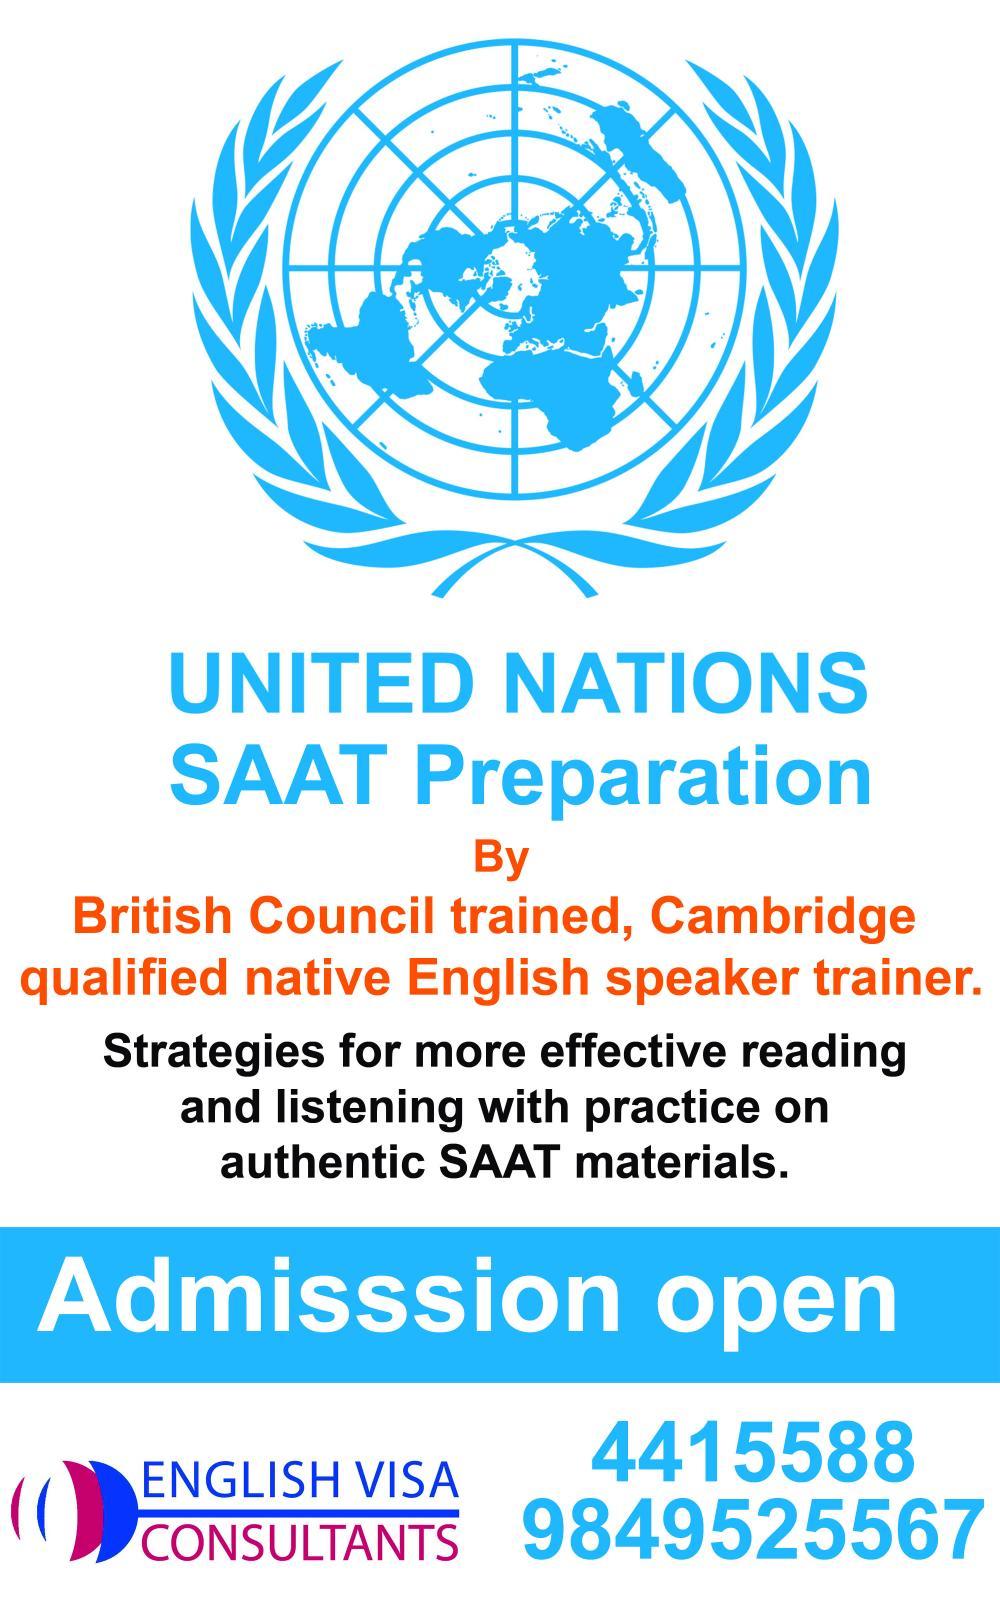 UN SAAT preparation clases